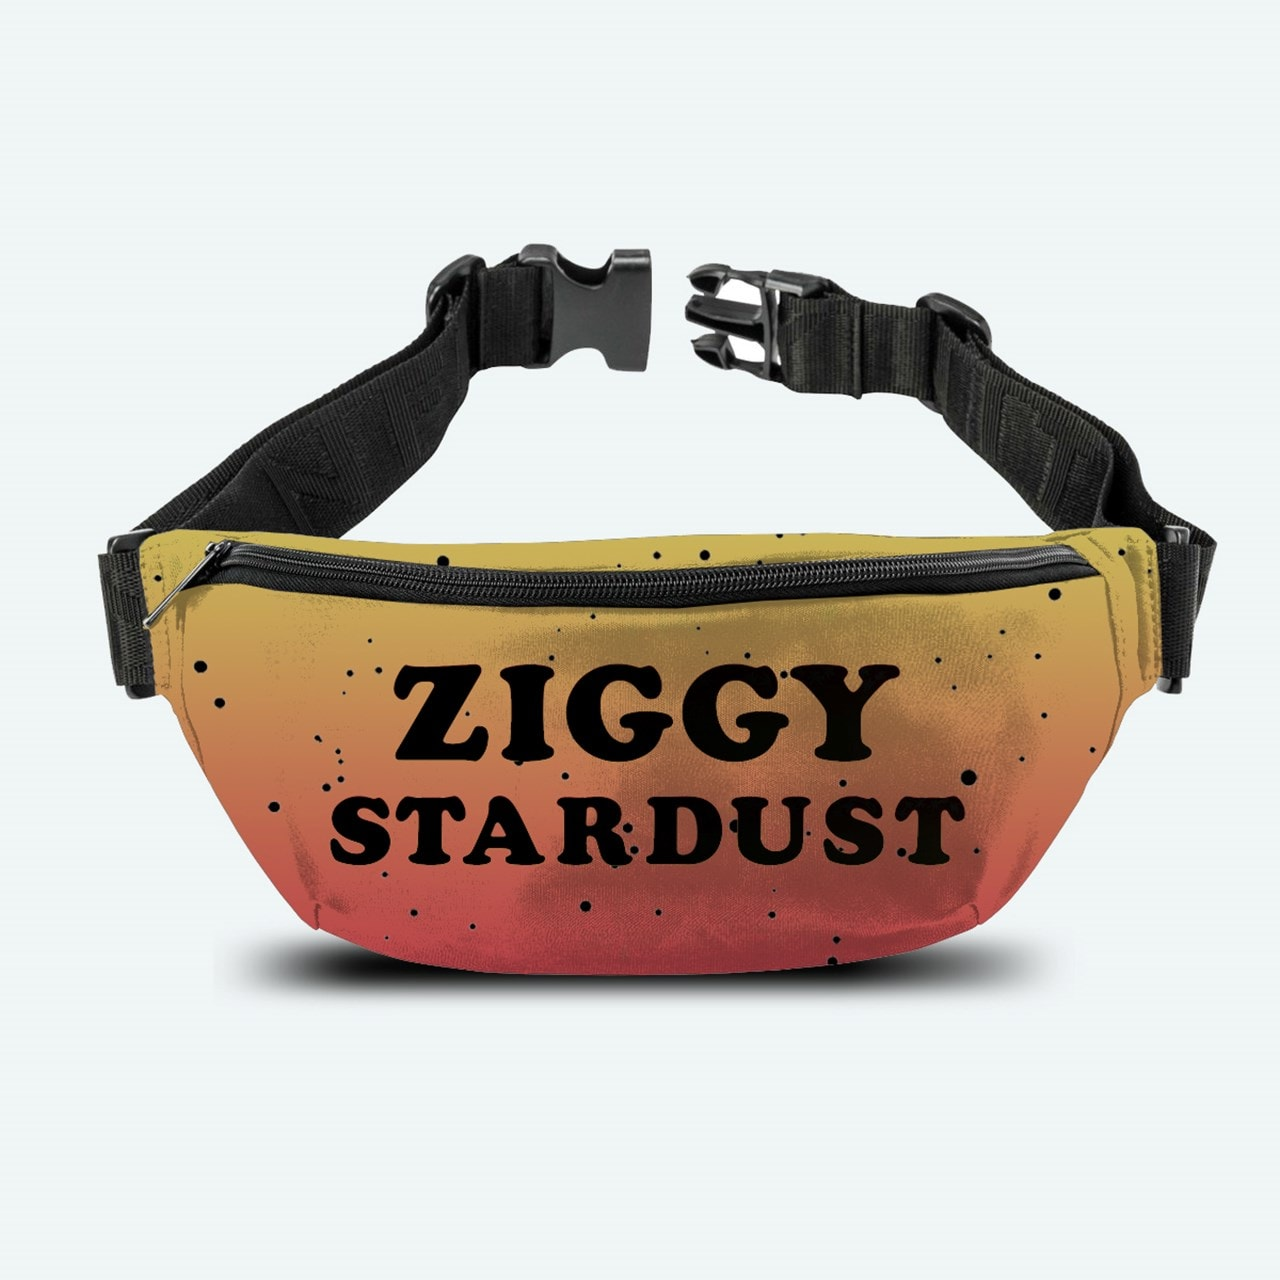 David Bowie: Ziggy Stardust Bum Bag - 1